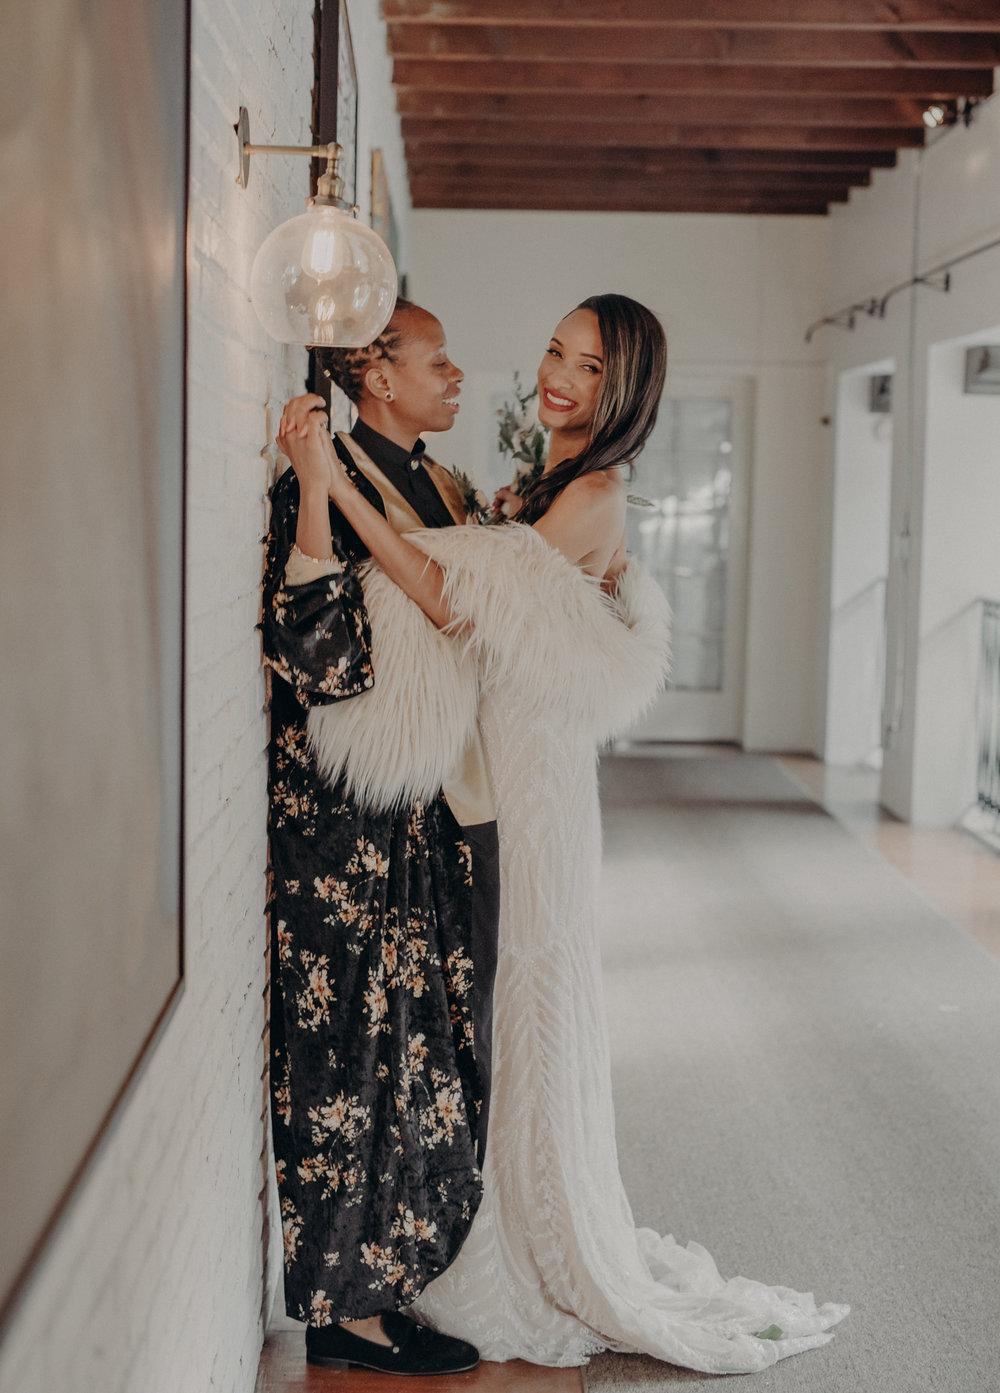 Wedding Photographer in Los Angeles - Ebell of Long Beach Wedding - LGBTQ weddings - lesbian wedding - IsaiahAndTaylor.com-074.jpg